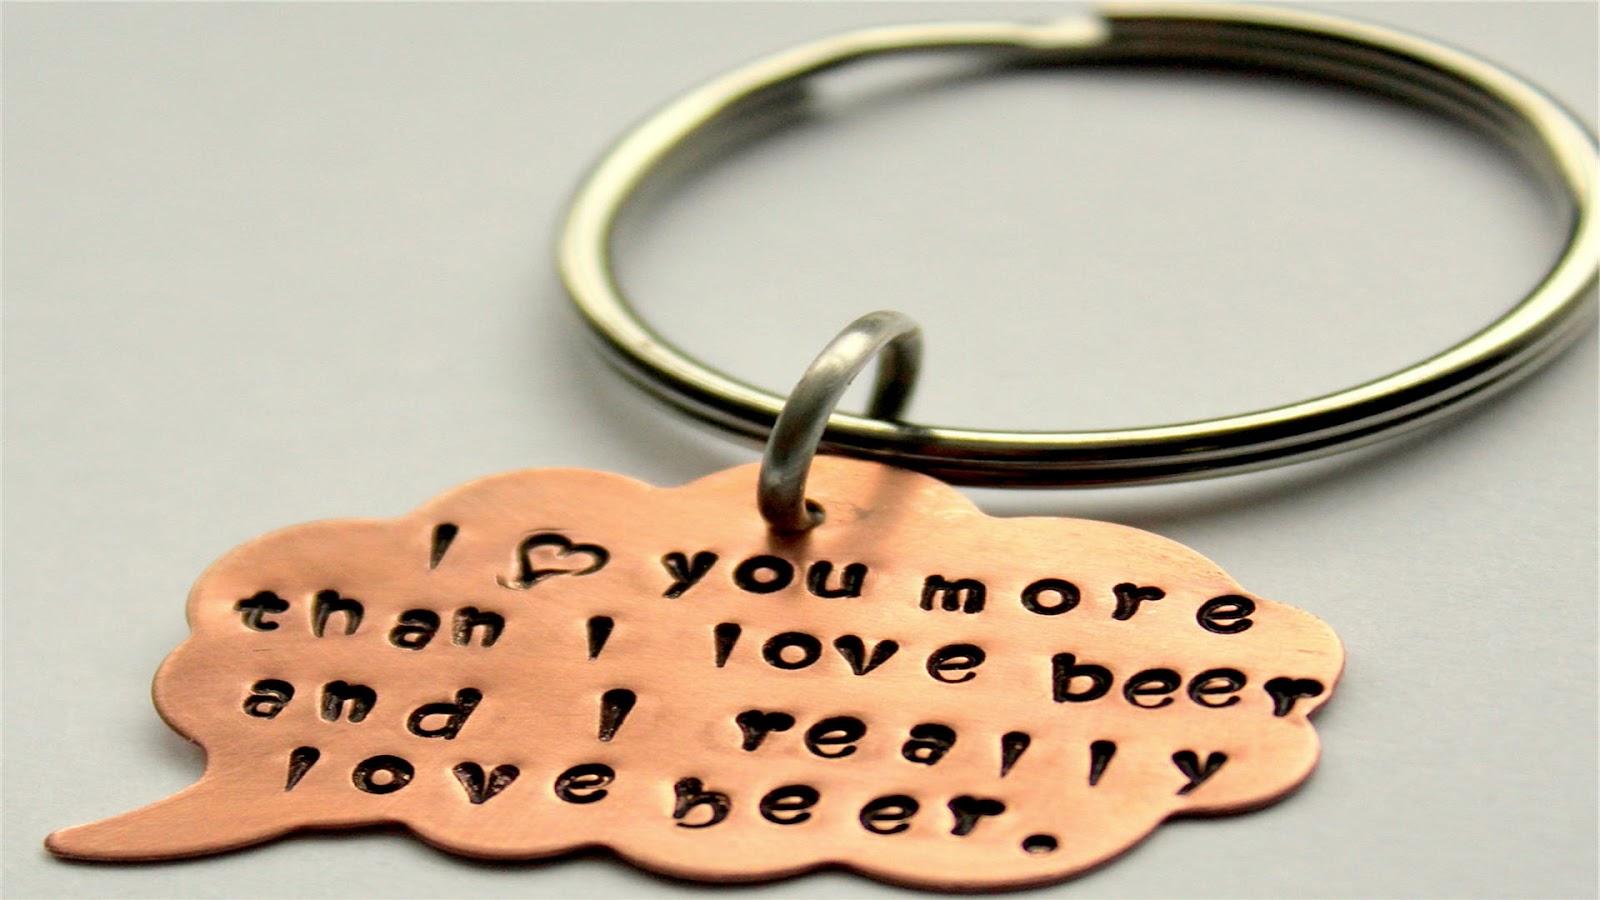 http://2.bp.blogspot.com/-UukcfvNGXDo/T6IpL_vDycI/AAAAAAAAB-k/BdOKENN9ApA/s1600/Love%2Bquotes%2Bby%2BMaceme%2BWallpaper%2B1.jpg